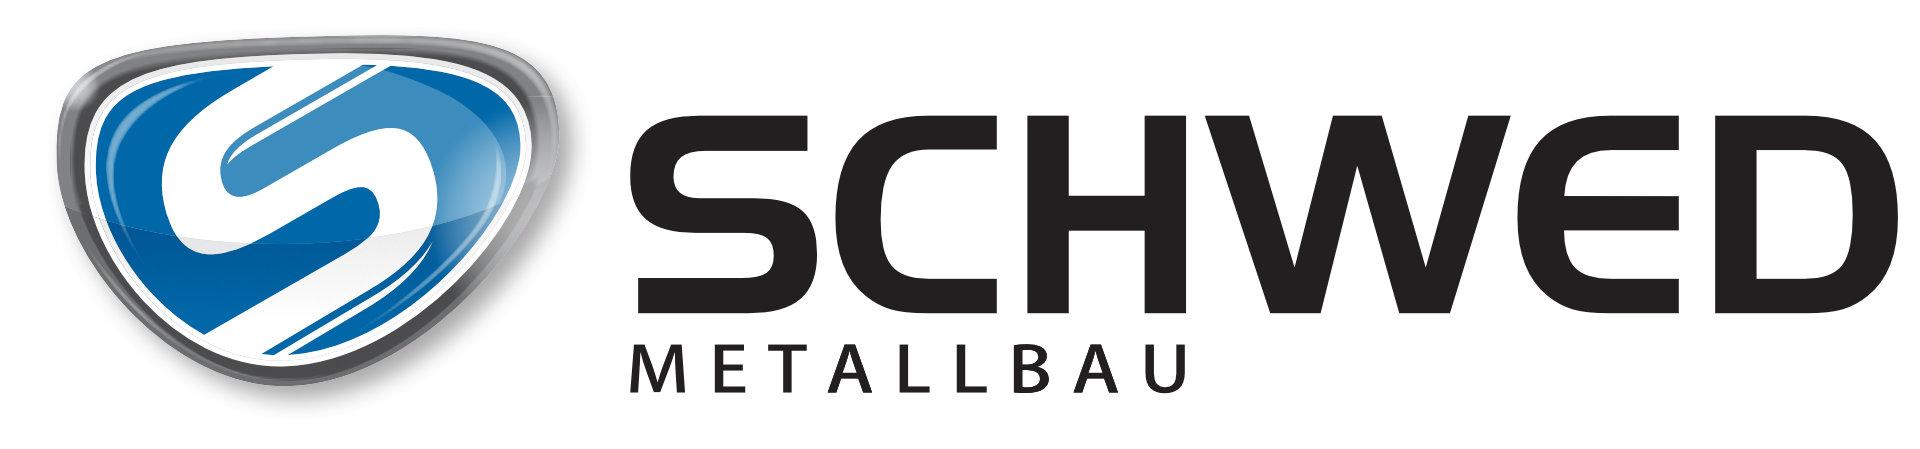 Schwed Metallbau Logo